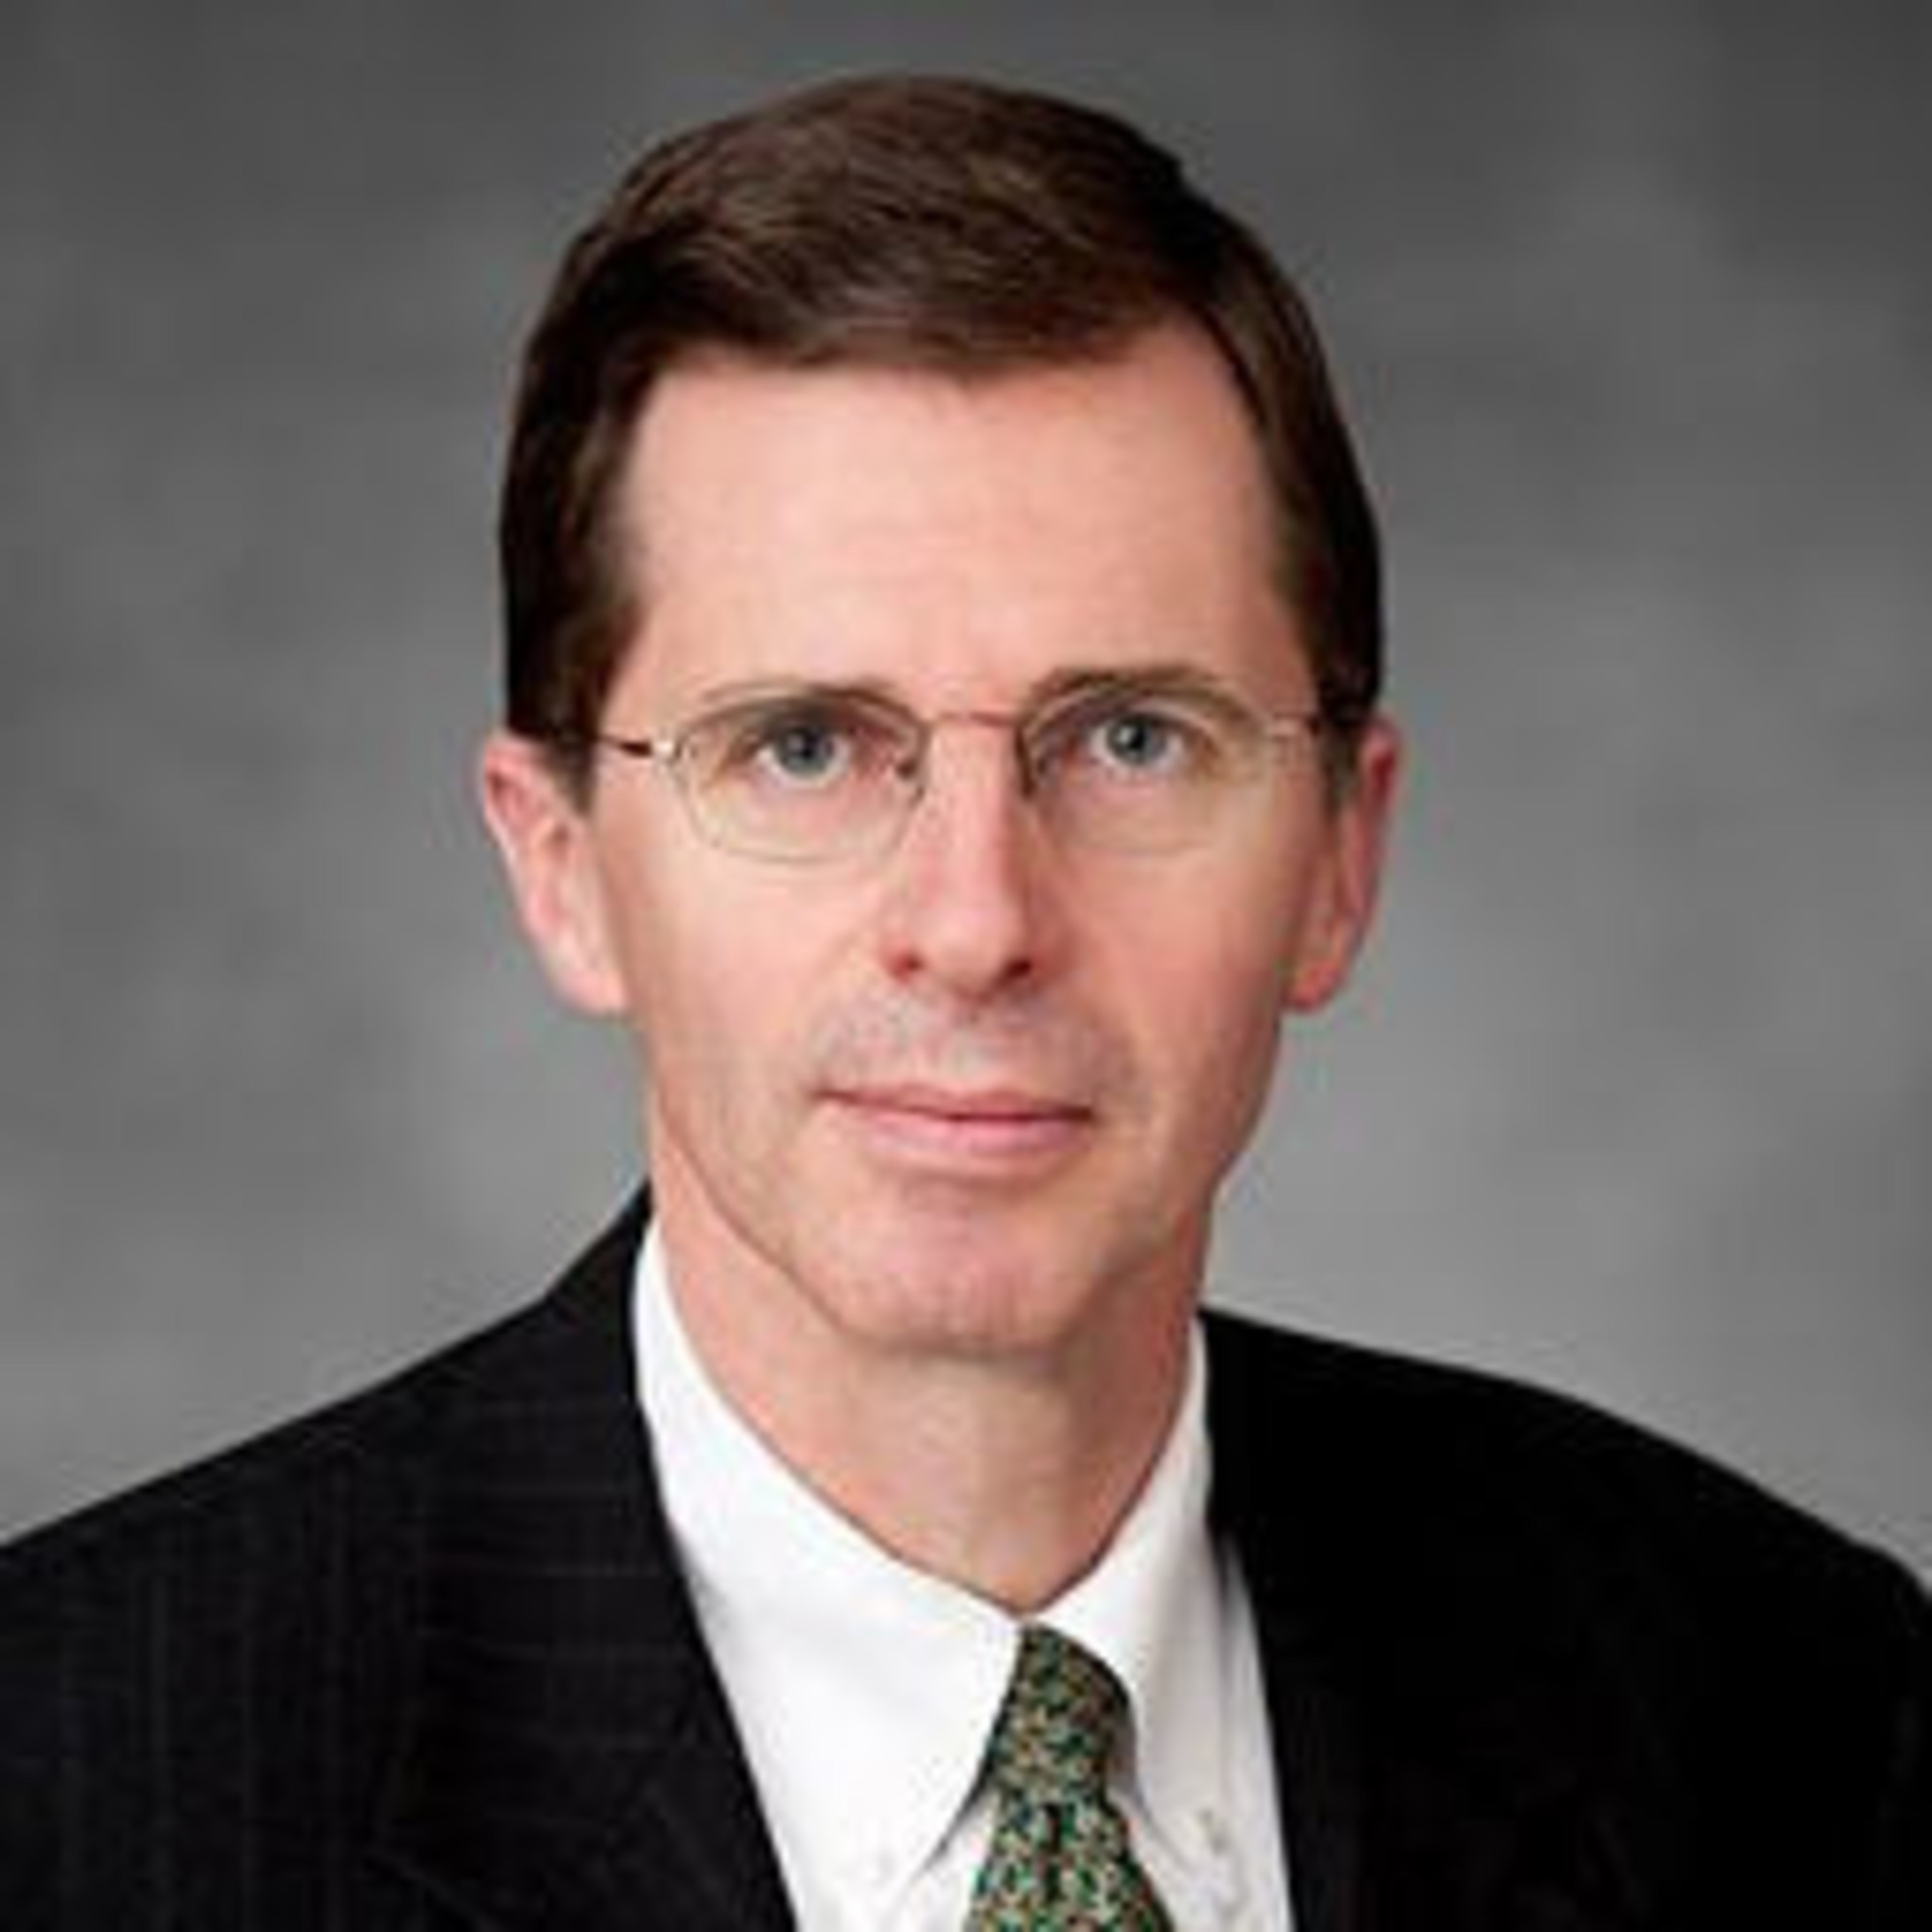 Jim Kilman Joins Board of Directors at alpha-En Corporation